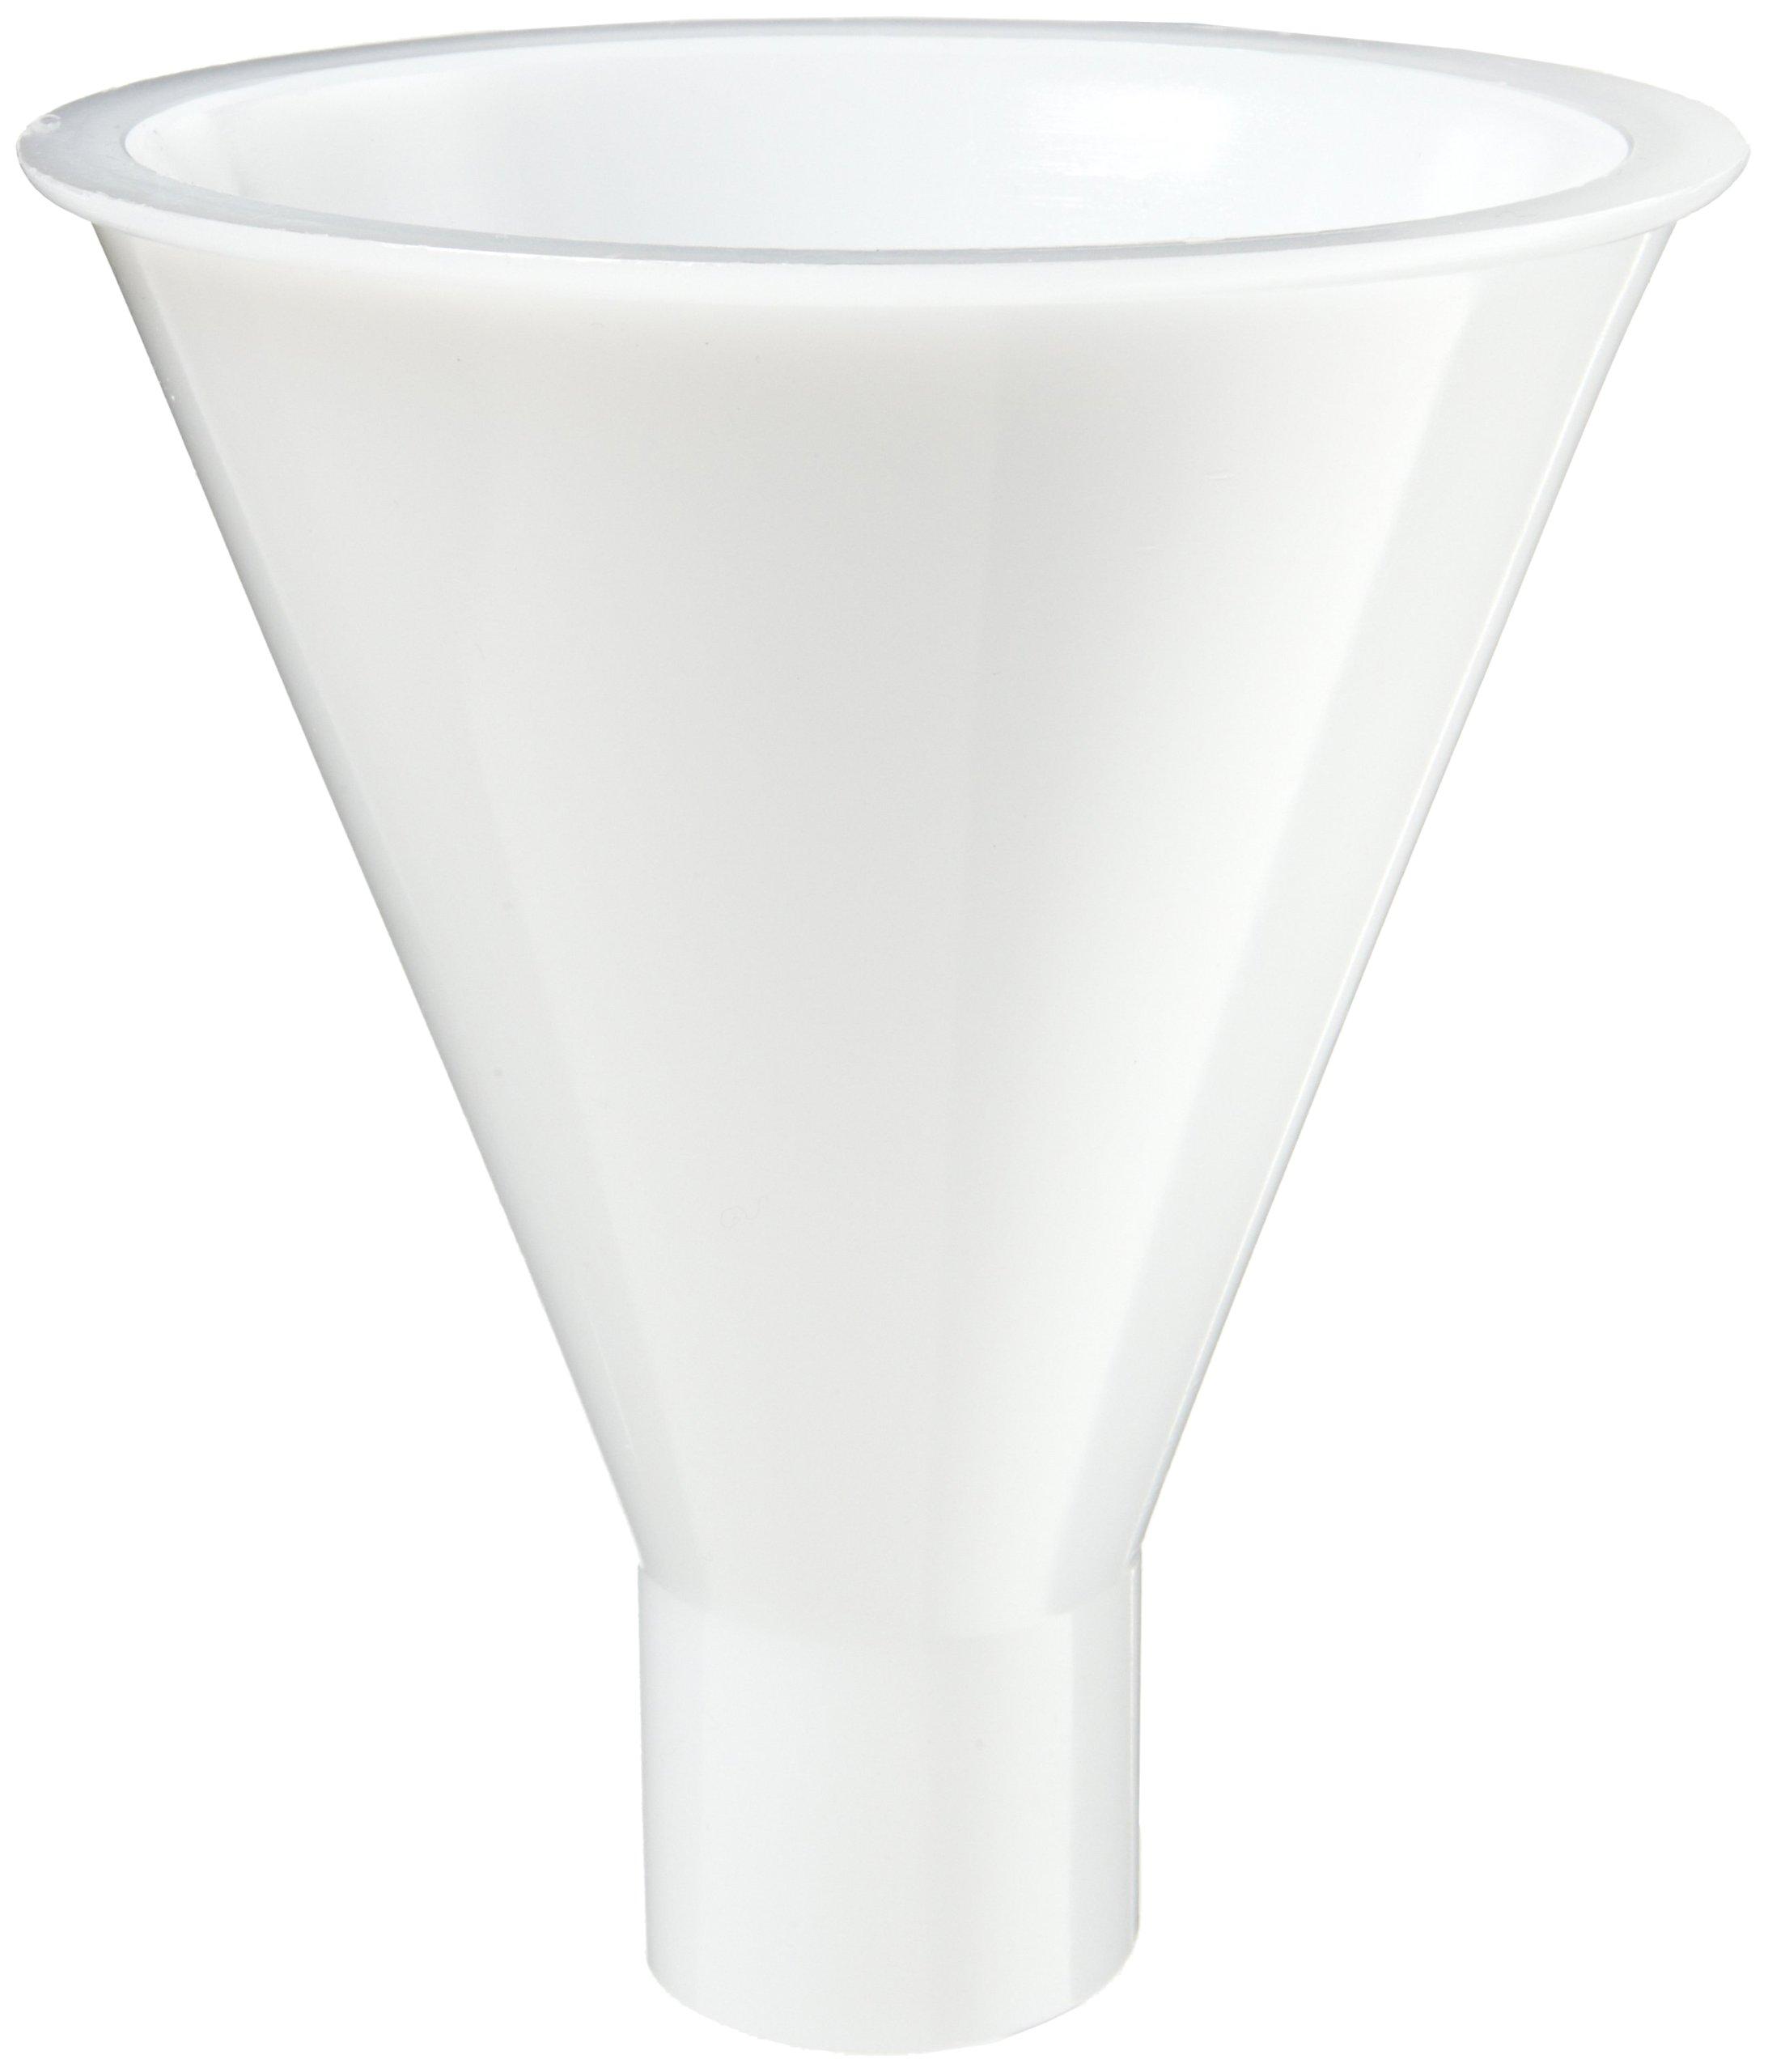 Bel-Art Polyethylene 510ml Large Powder Funnel (H14684-0000) by SP Scienceware